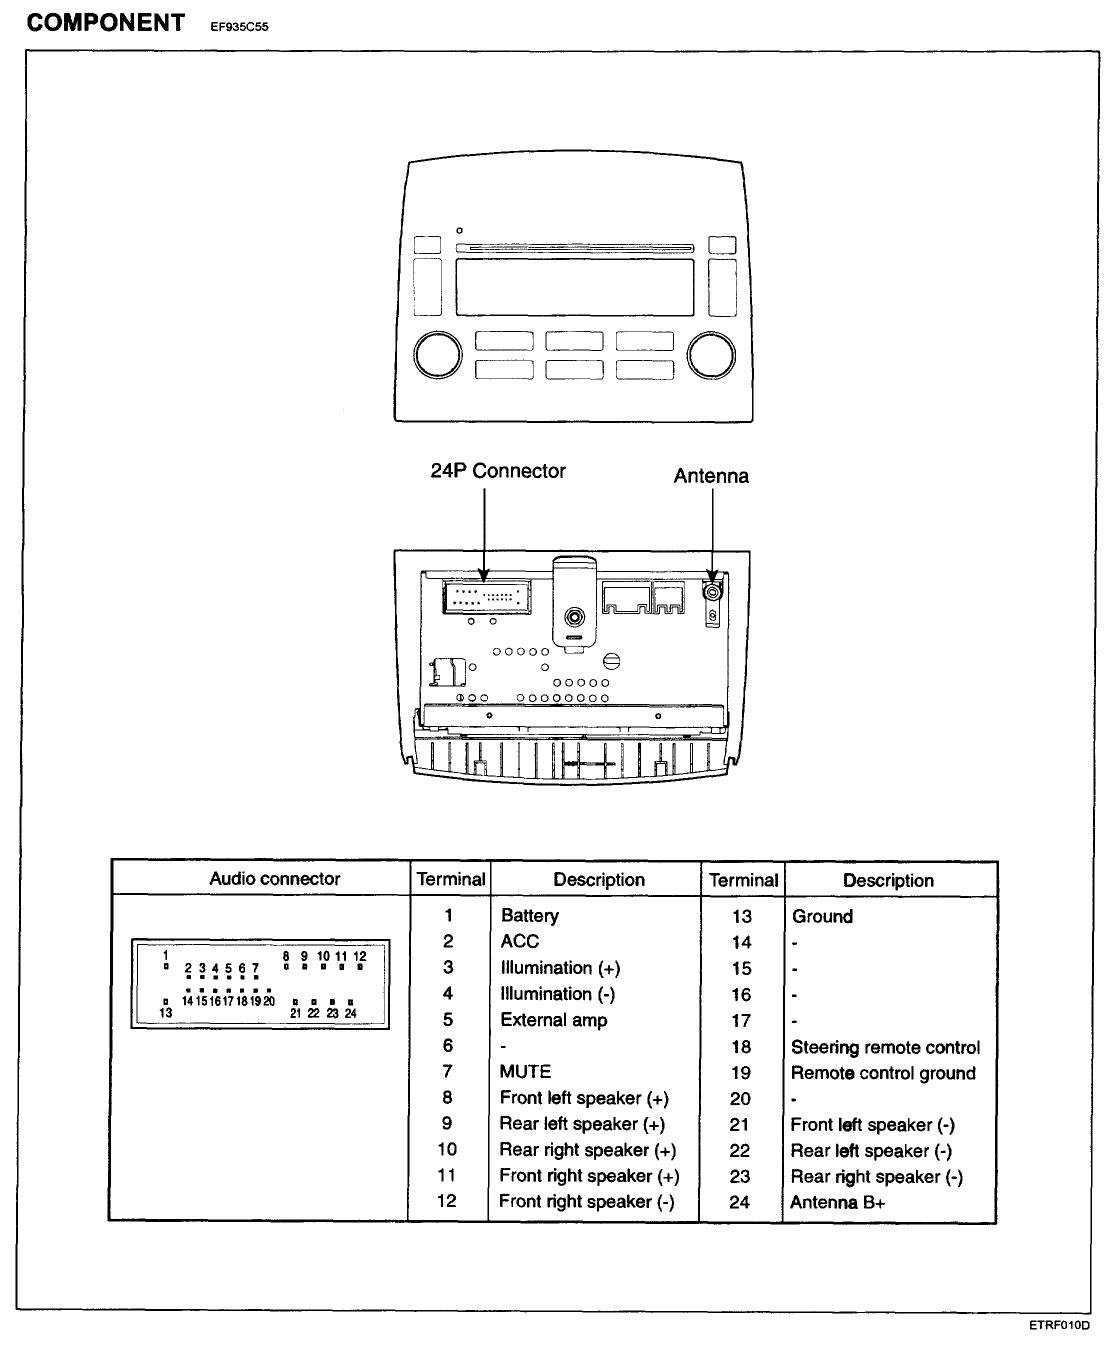 2003 hyundai sonata radio wiring diagram wiring schematic diagramhyundai wiring color codes basic electronics wiring diagram